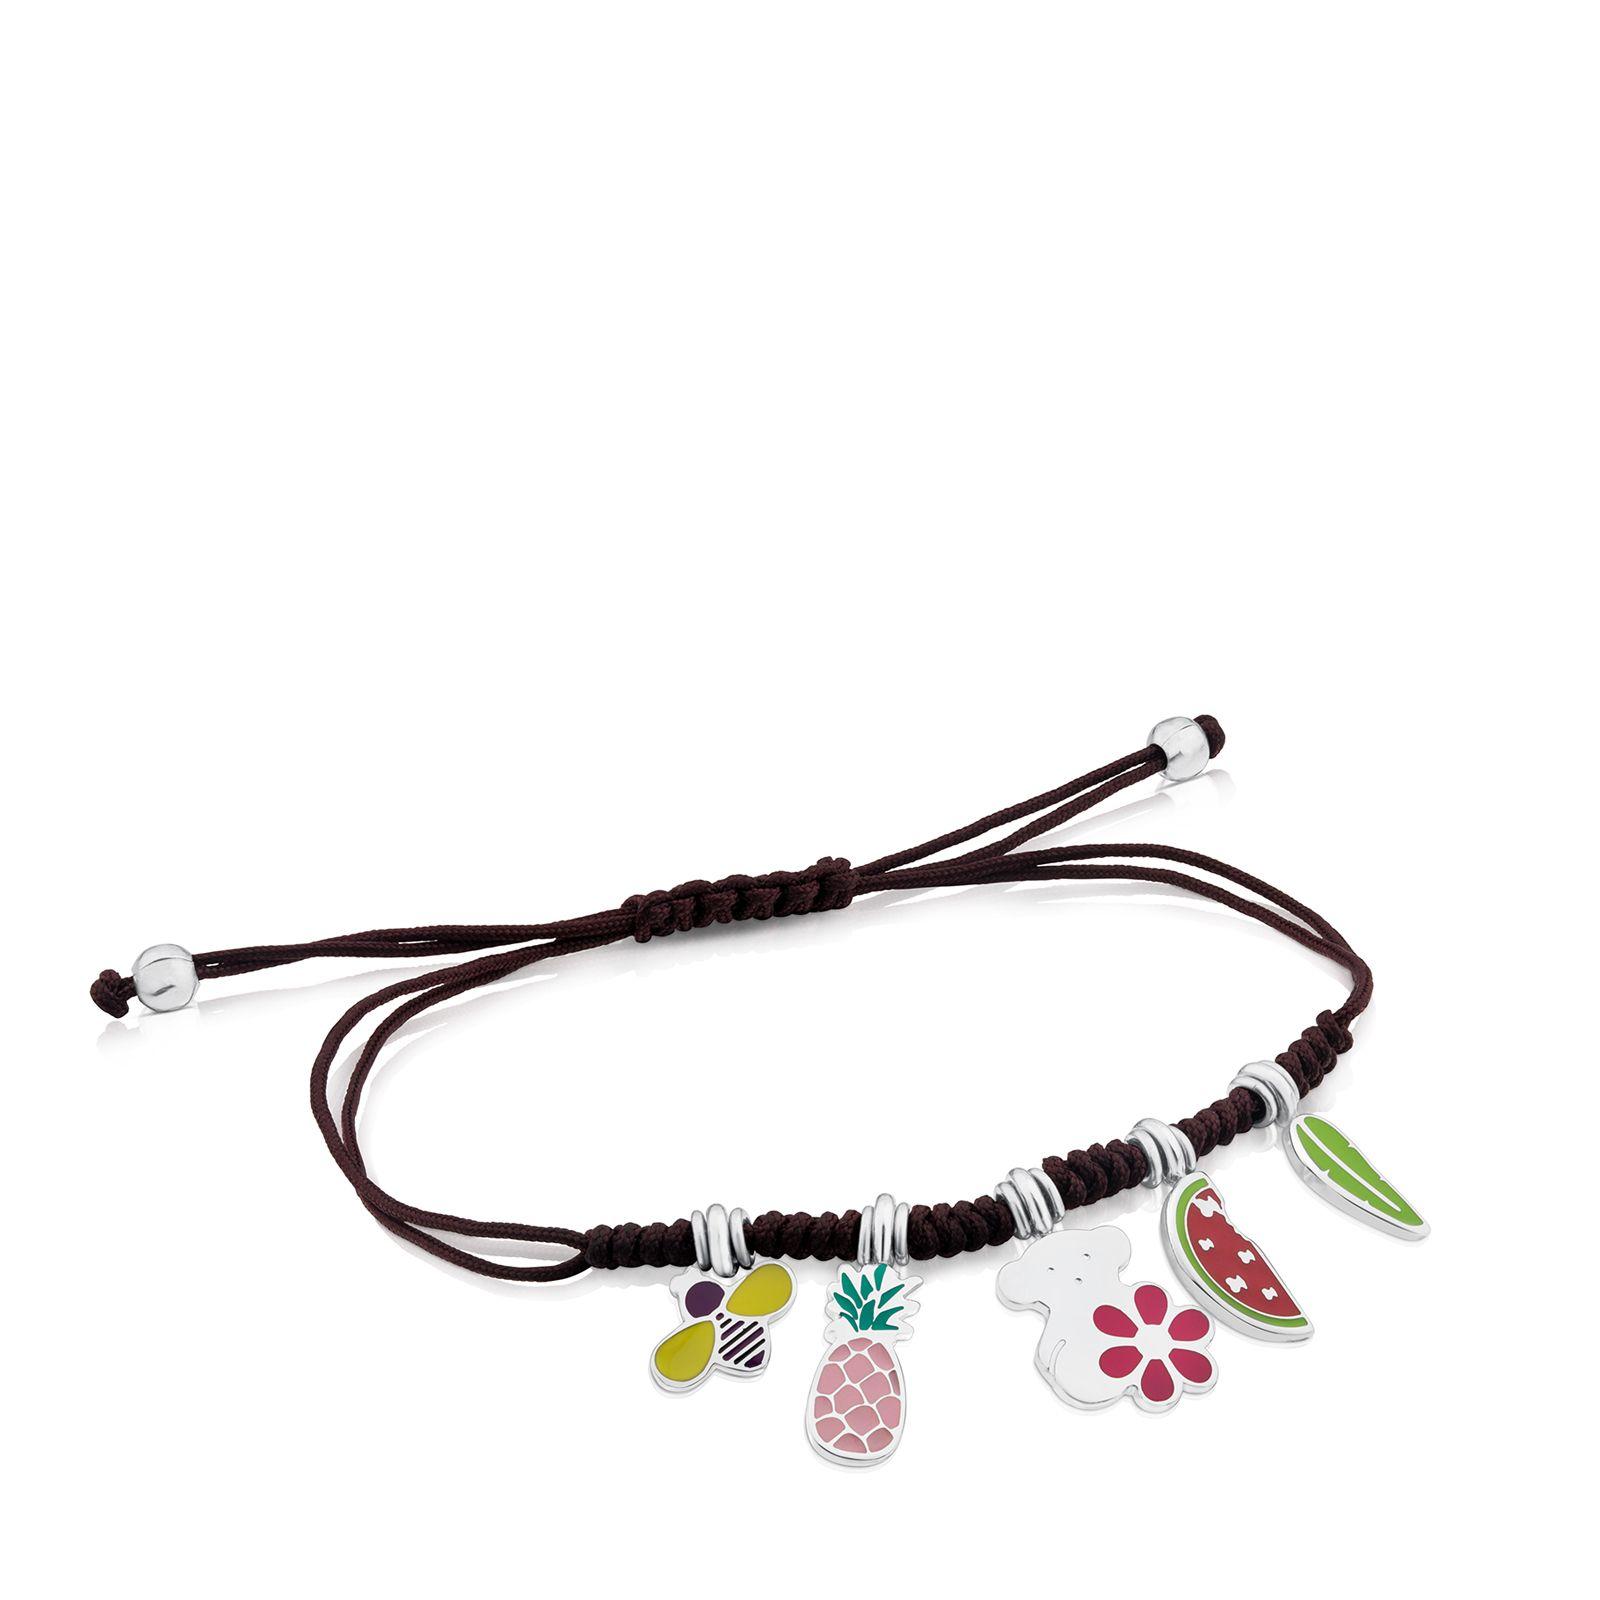 797a39ae0a75 Pulsera TOUS Chokers de Plata Vermeil rosa y Cordón en color marino ...